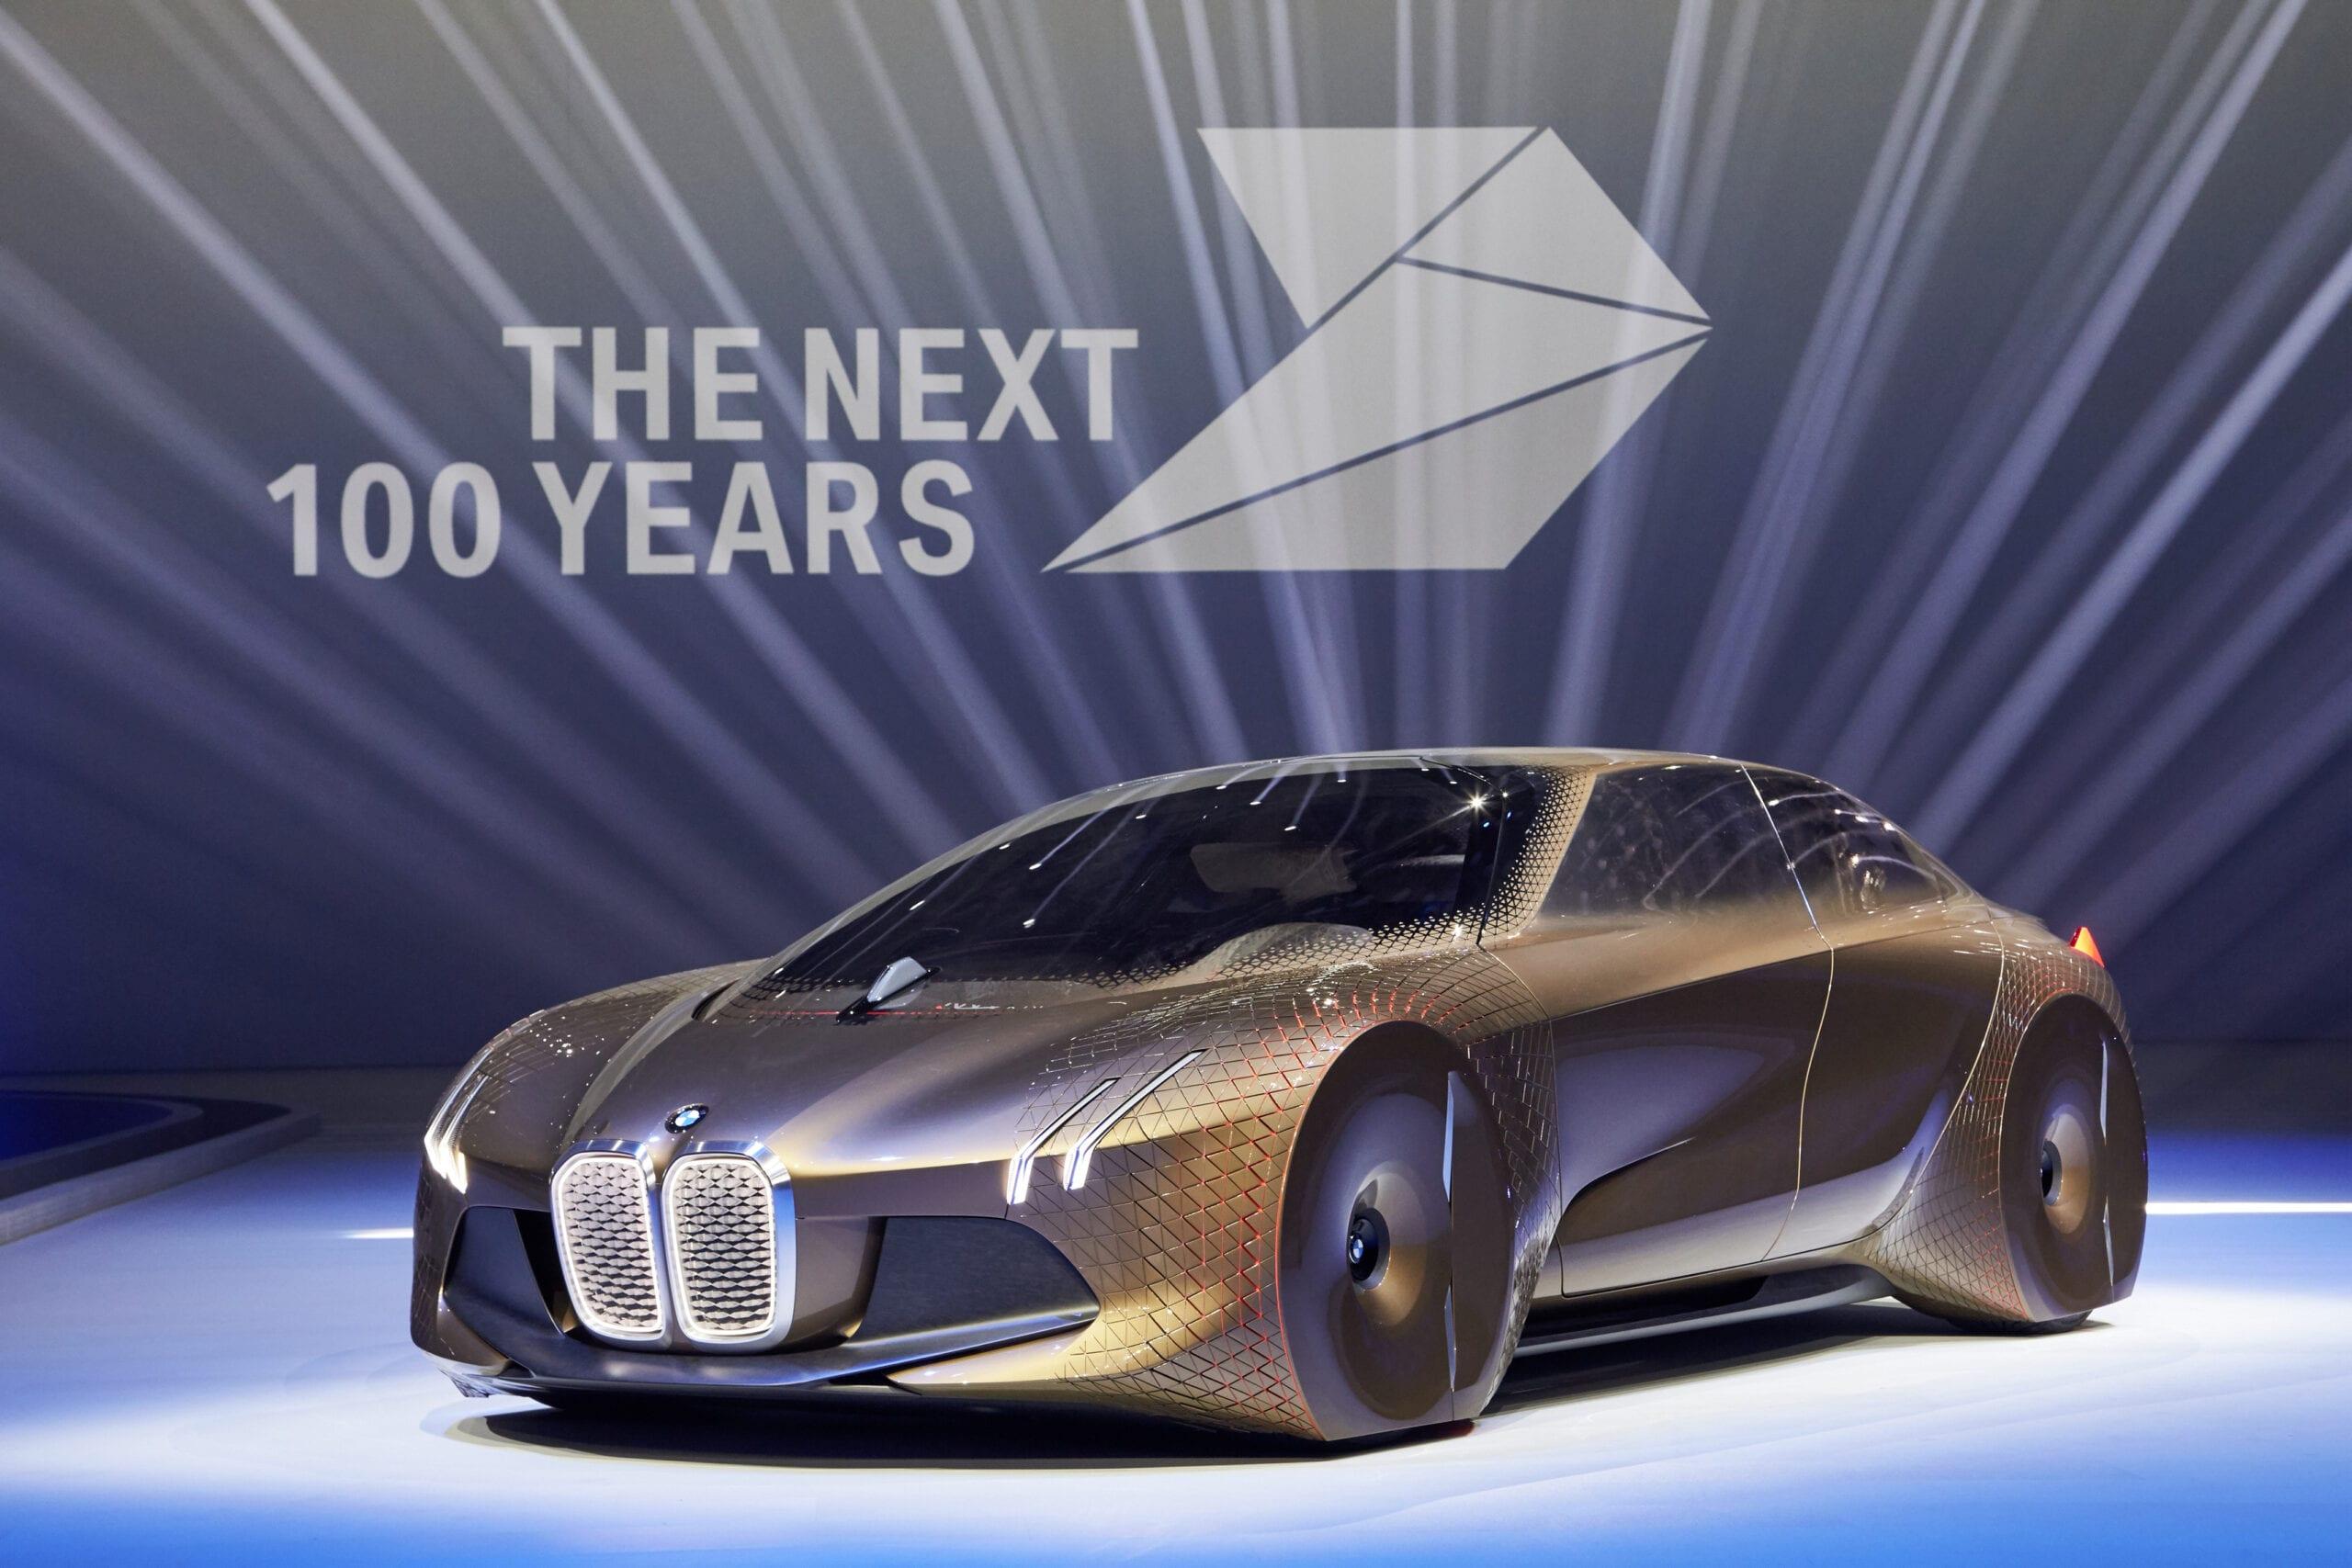 The Next 100 Years >> The Next 100 Years